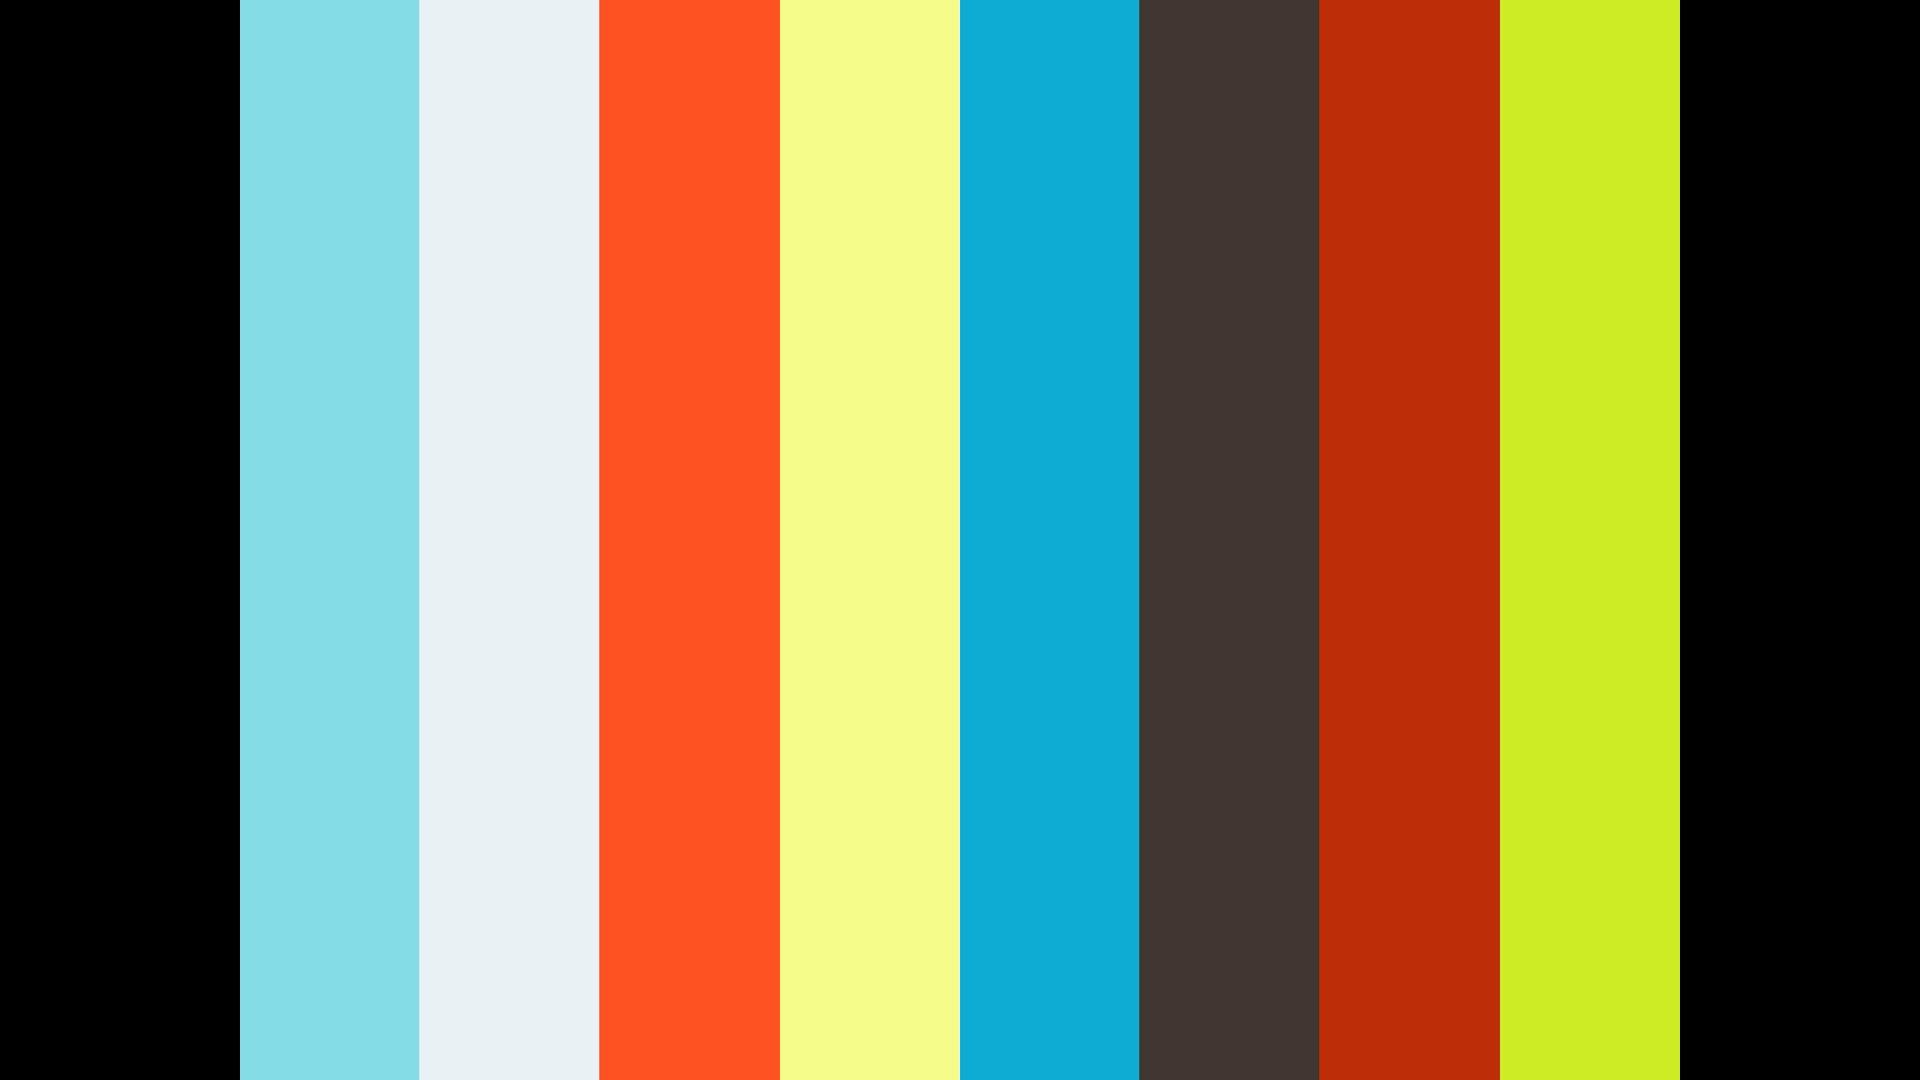 Programa TOROS EN EL MUNDO-TV… Román, Curro Díaz. Colombo, Fererrera, Joselito, Roca Rey, Saldívar. Por José Mata